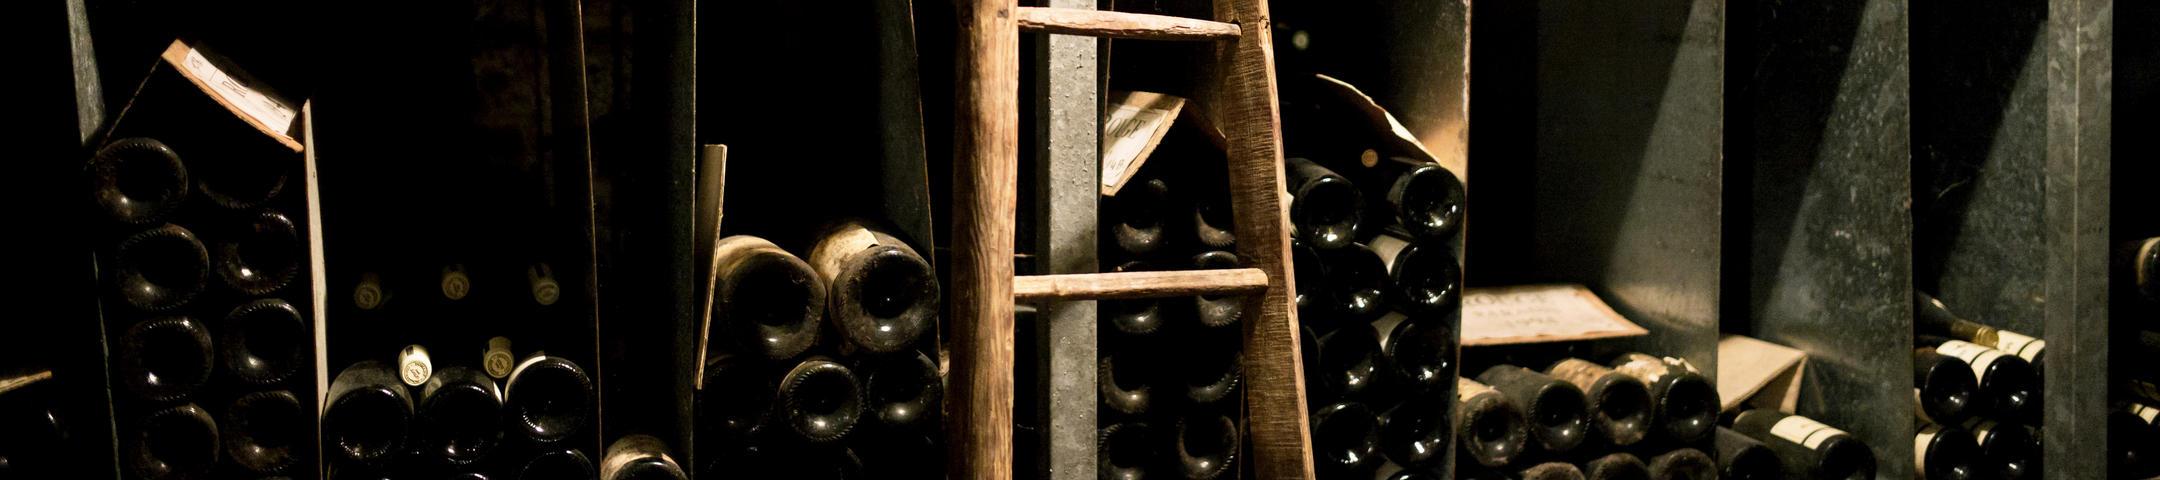 The buyer's cellar